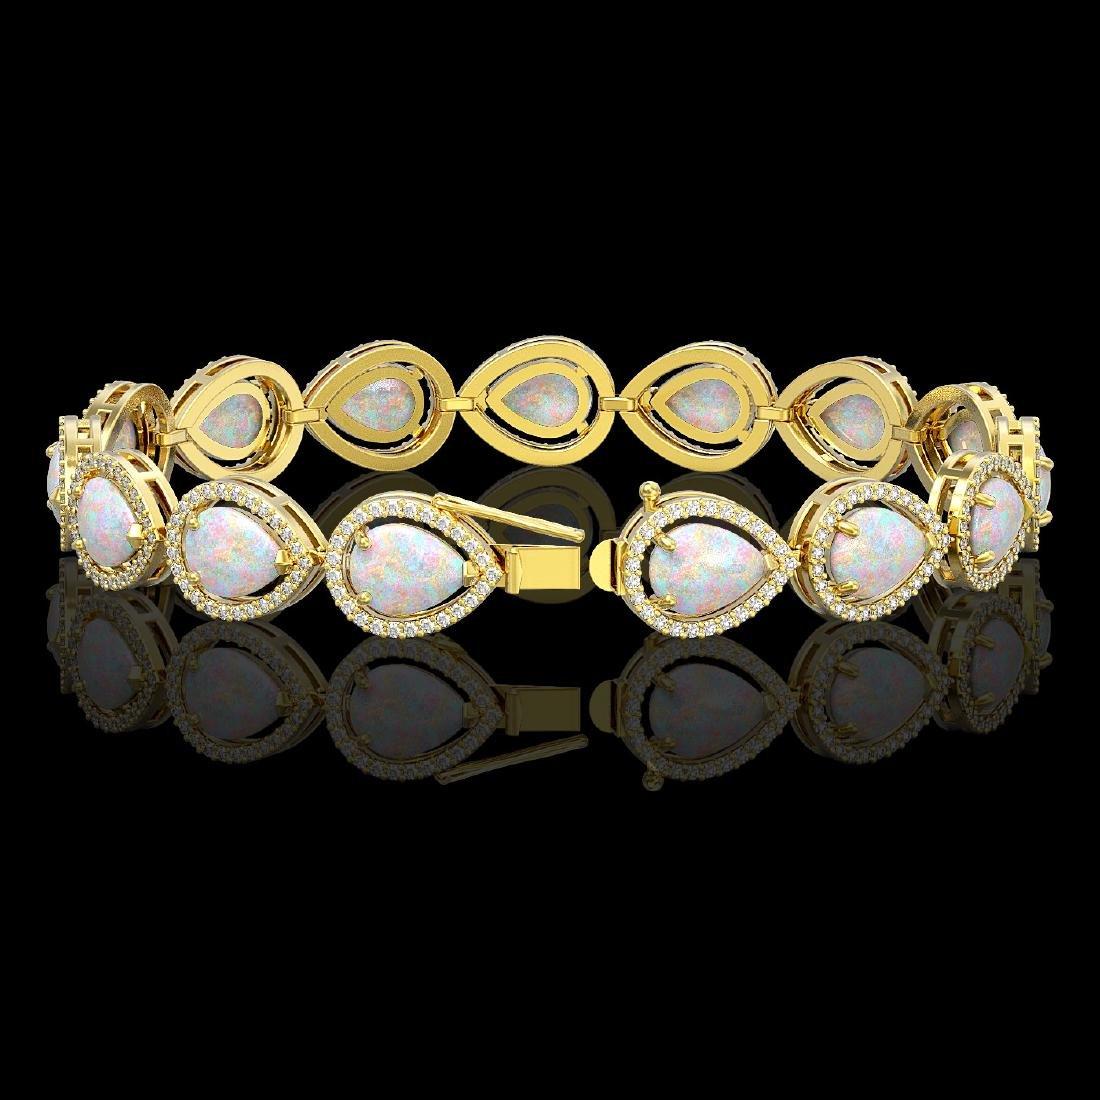 17.15 CTW Opal & Diamond Halo Bracelet 10K Yellow Gold - 2